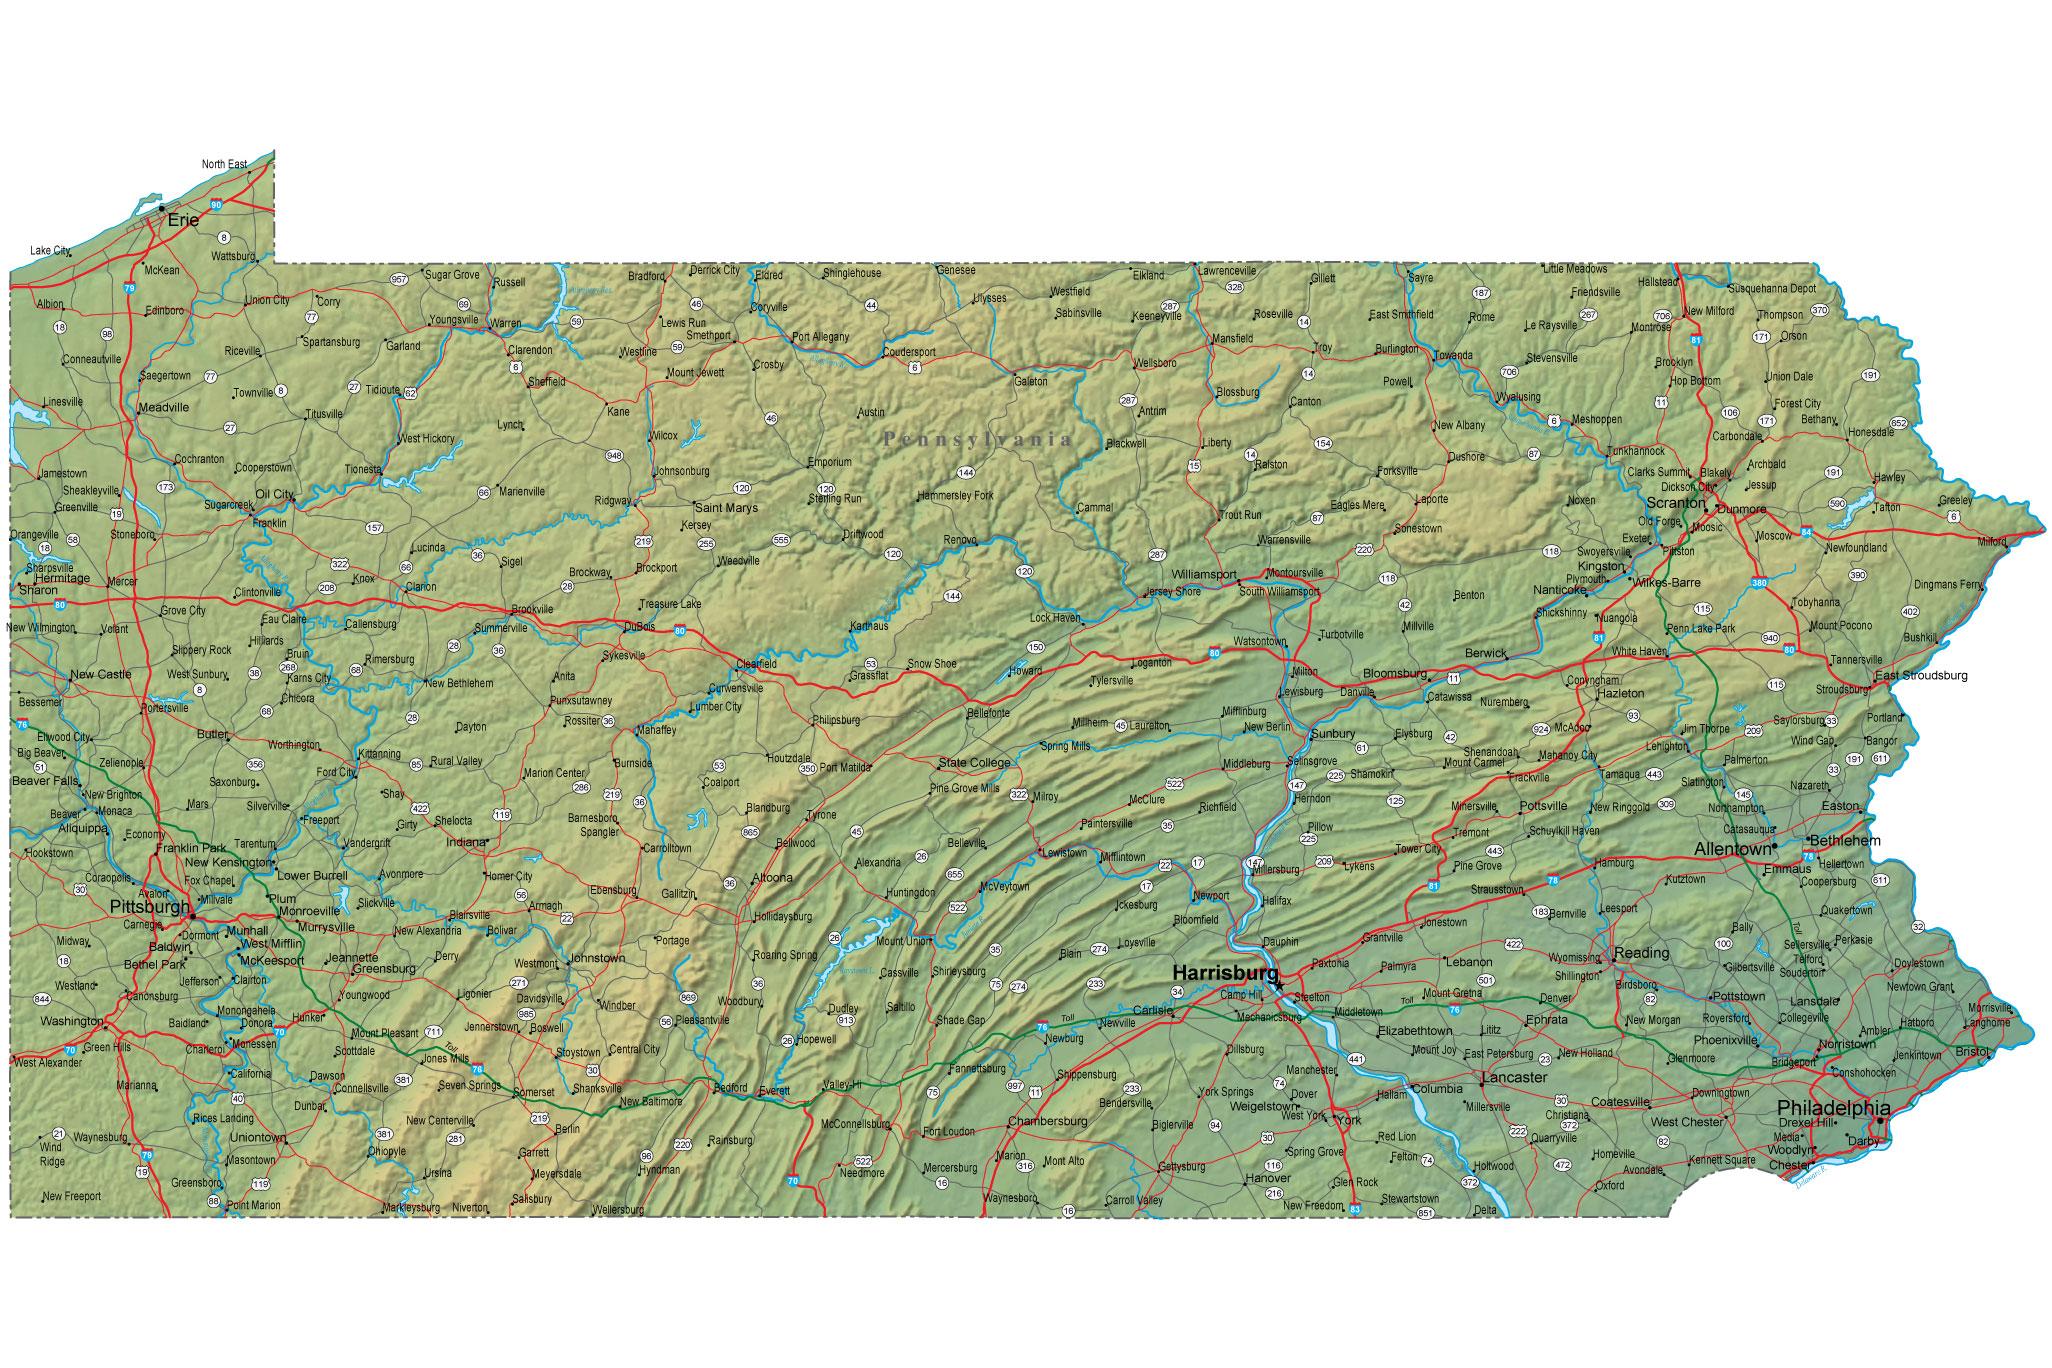 Pennsylvania - Sights